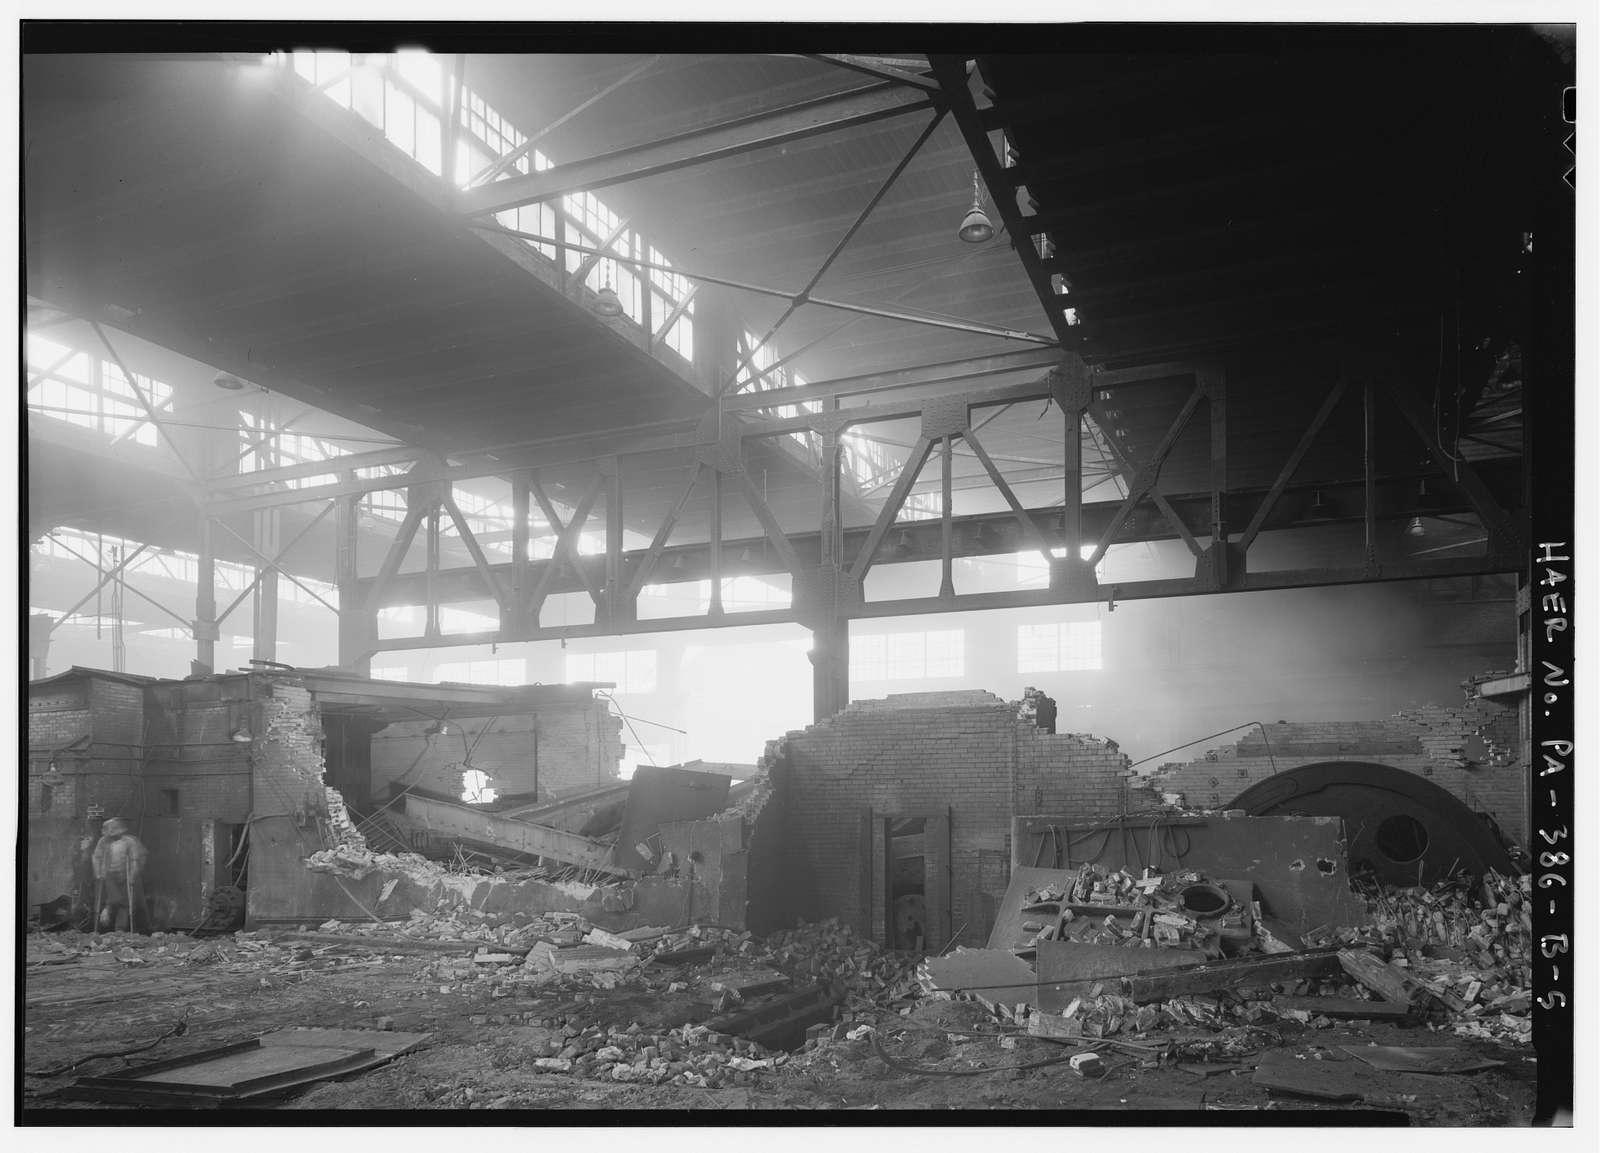 Bethlehem Steel Corporation, South Bethlehem Works, Rolling Mill, Along Lehigh River, North of Fourth Street, West of Minsi Trail Bridge, Bethlehem, Northampton County, PA